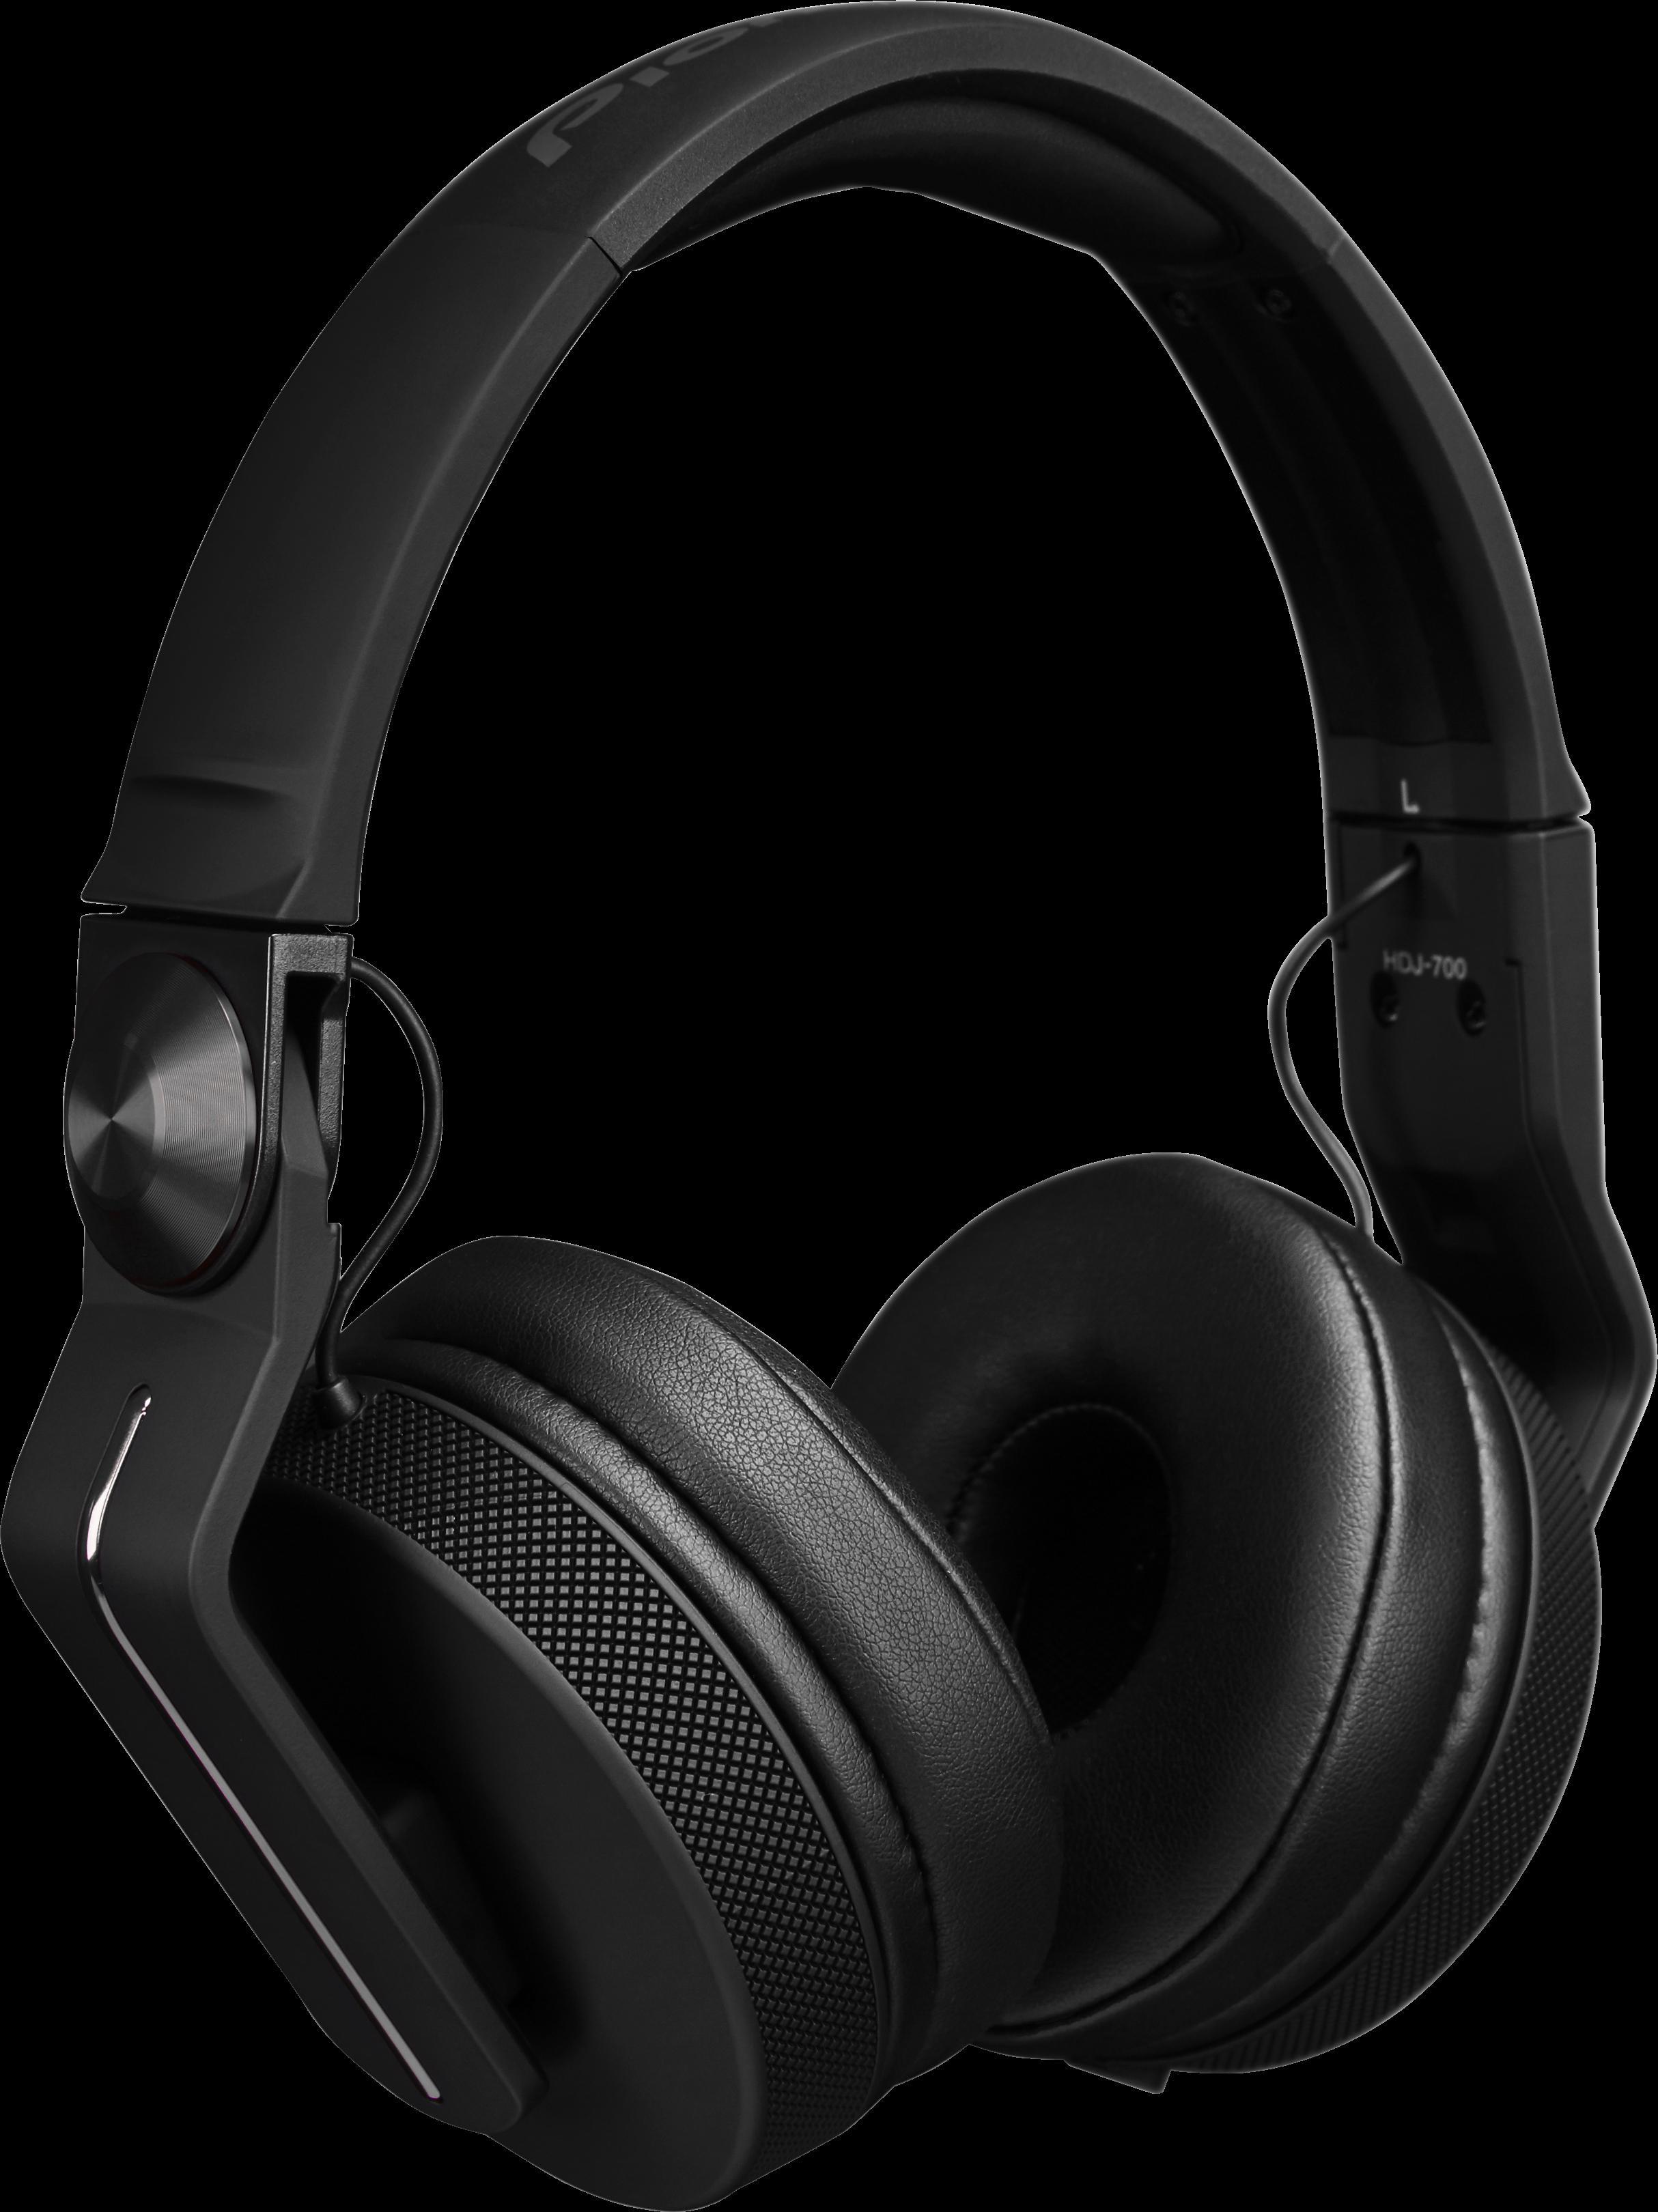 38c91175fce HDJ-700-K DJ headphones (black) - Pioneer DJ